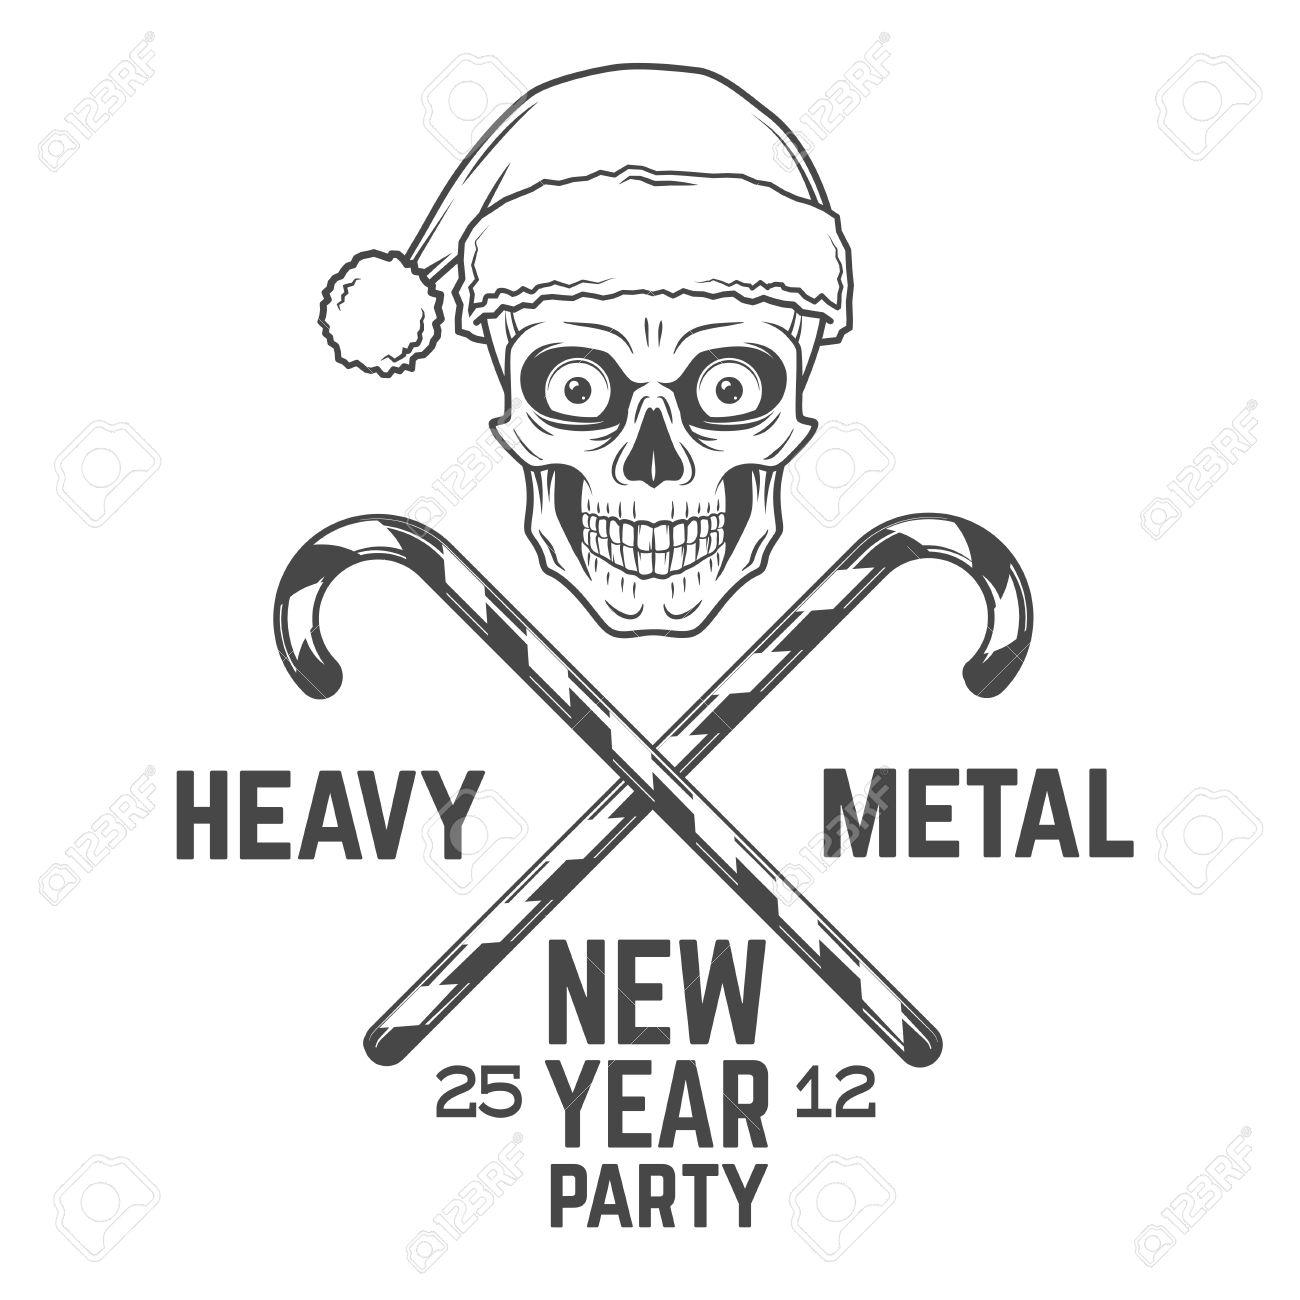 bad santa claus biker with candies print design heavy metal